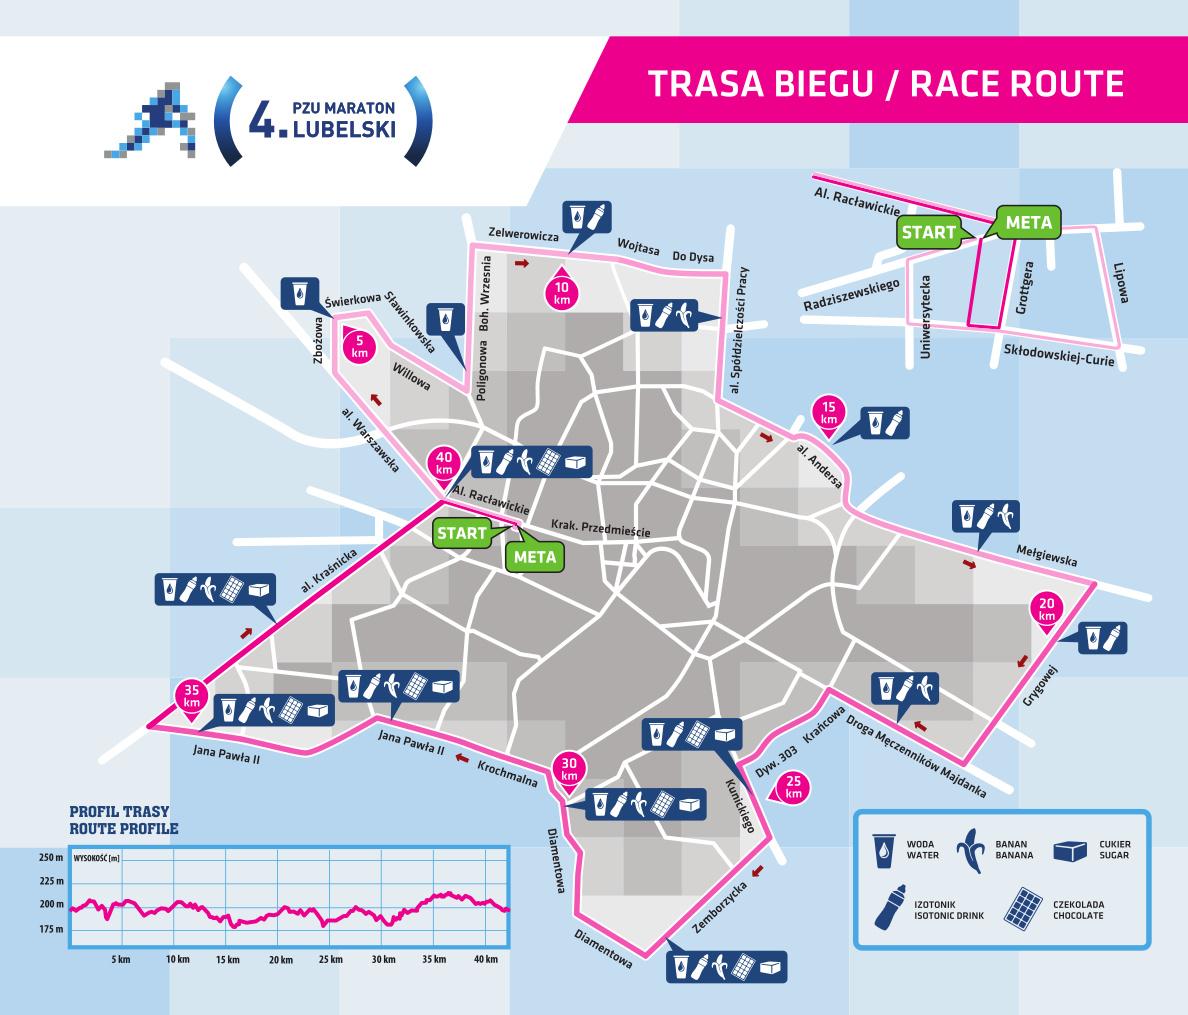 Trasa 4. PZU Maraton Lubelski